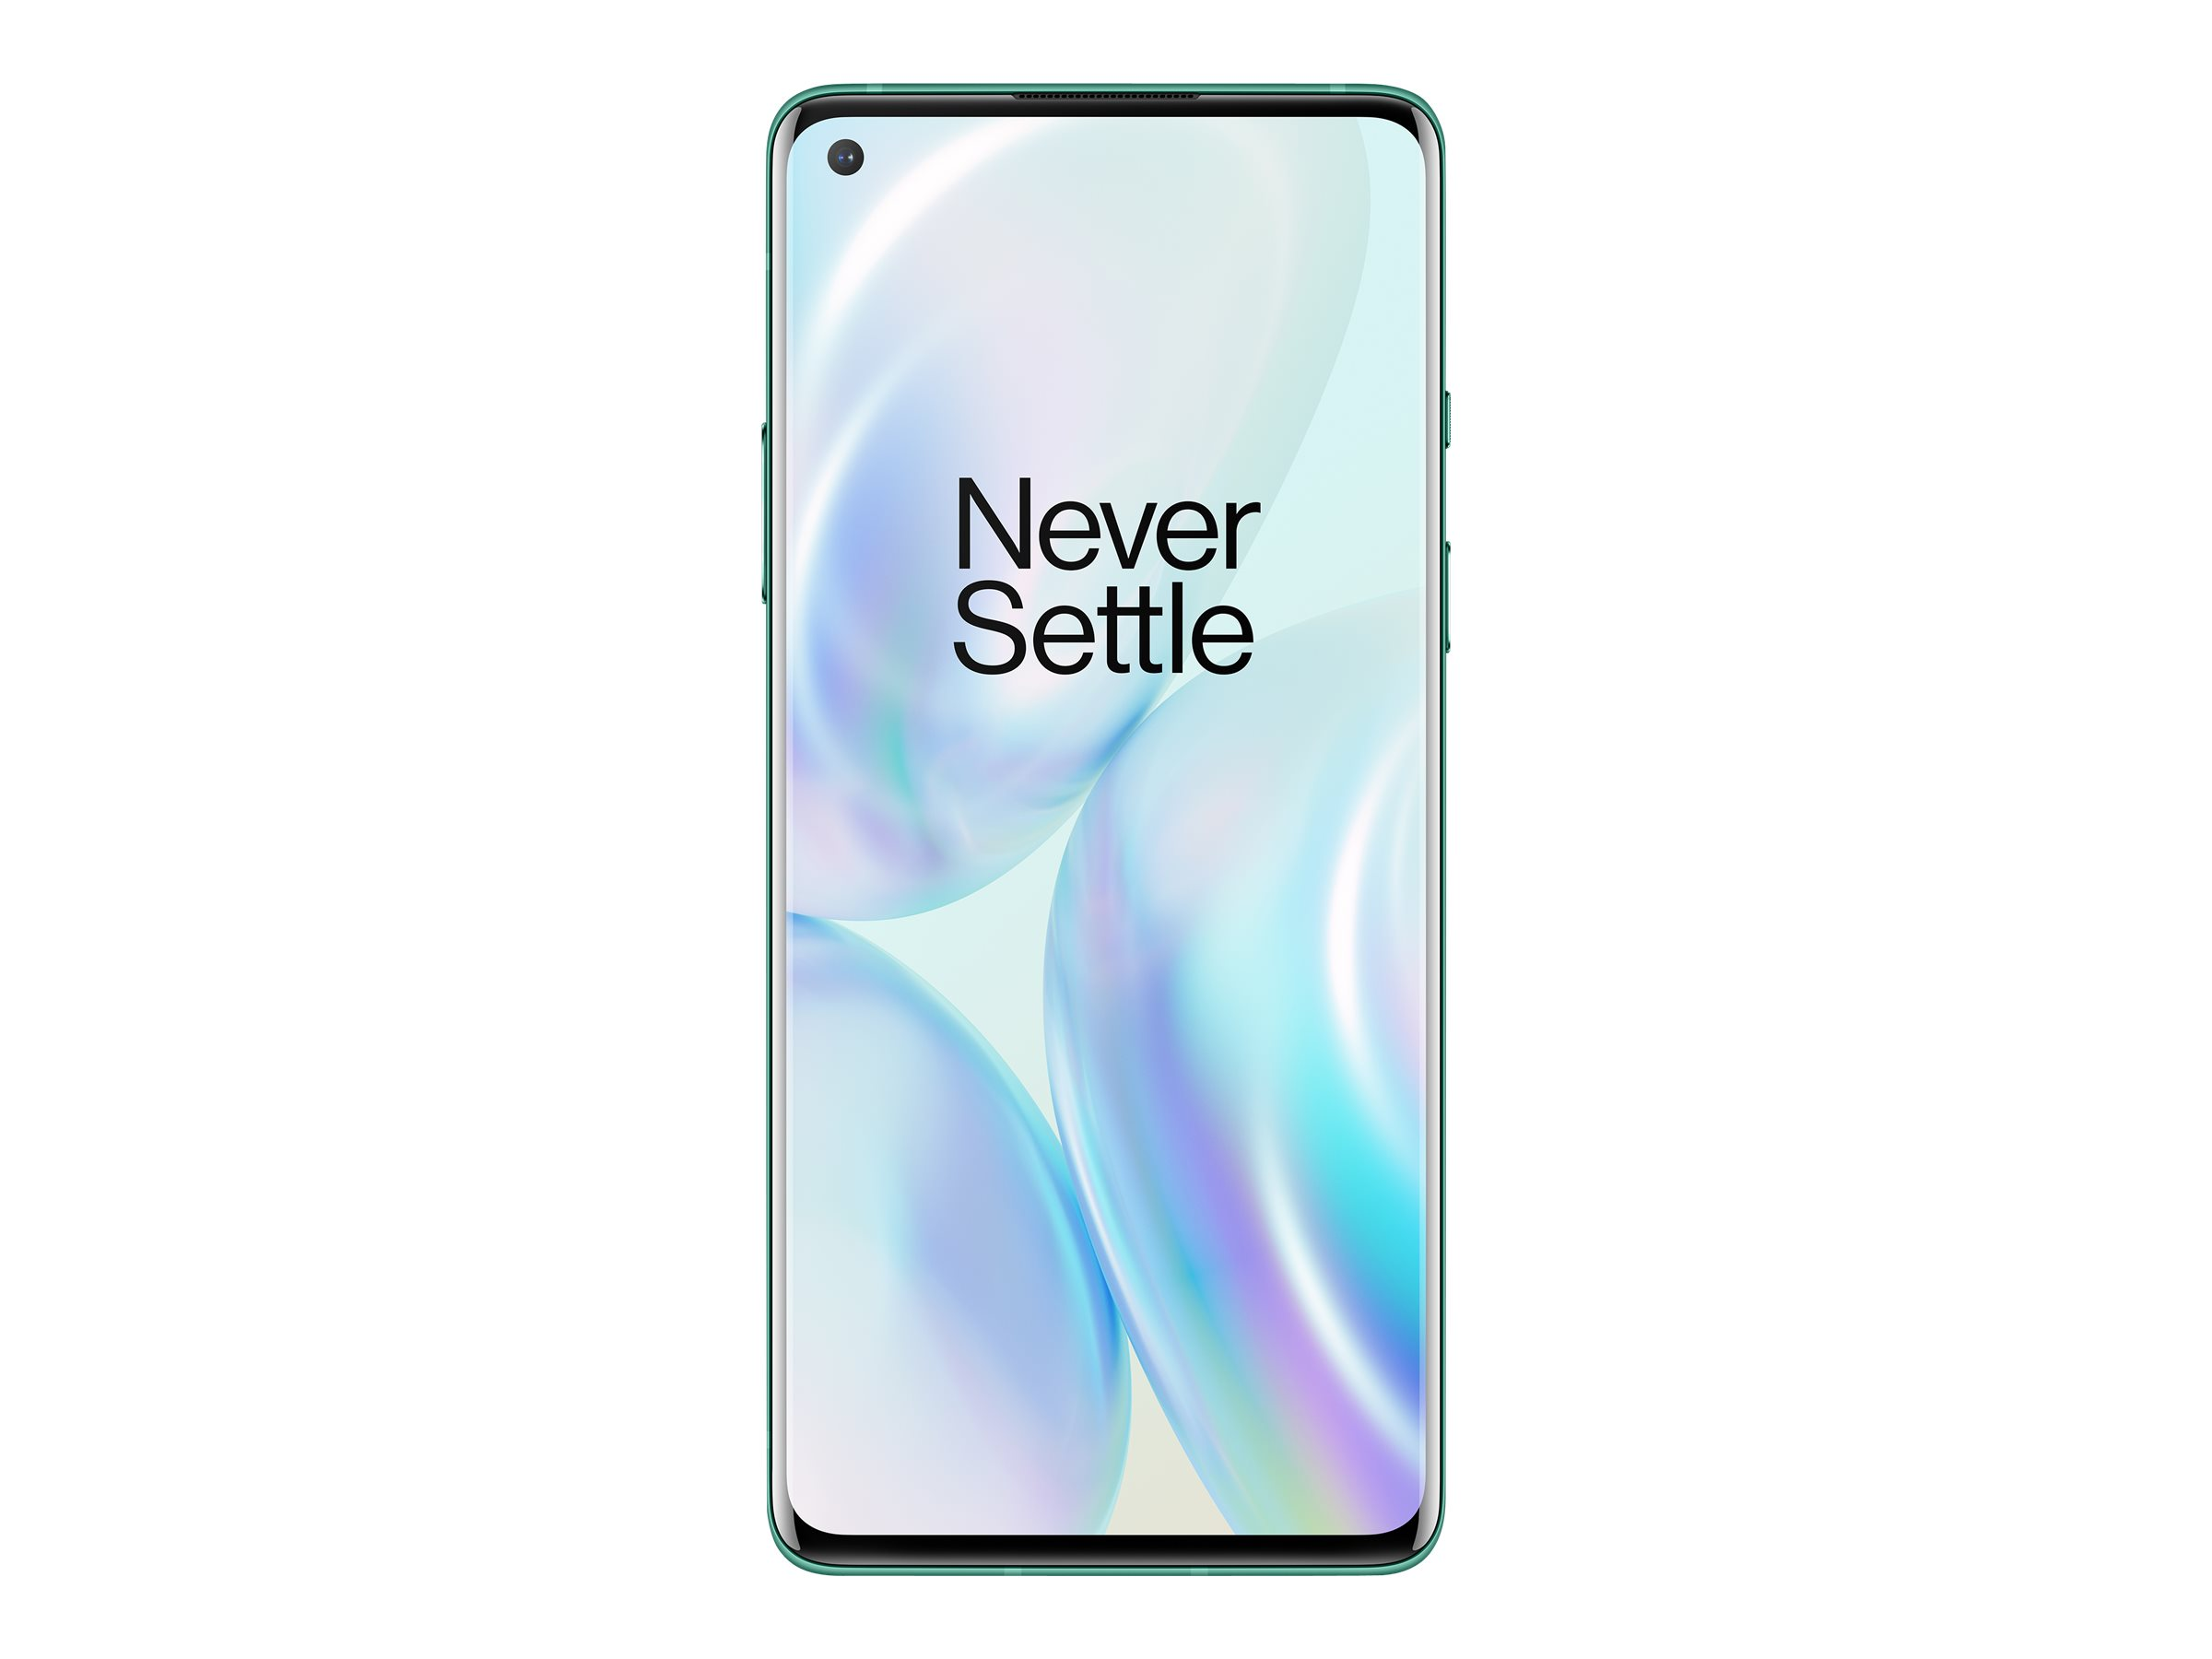 "Vorschau: OnePlus 8 - Smartphone - Dual-SIM - 5G NR - 256 GB - CDMA / GSM - 6.55"" - 2400 x 1080 Pixel (402 ppi (Pixel pro Zoll))"